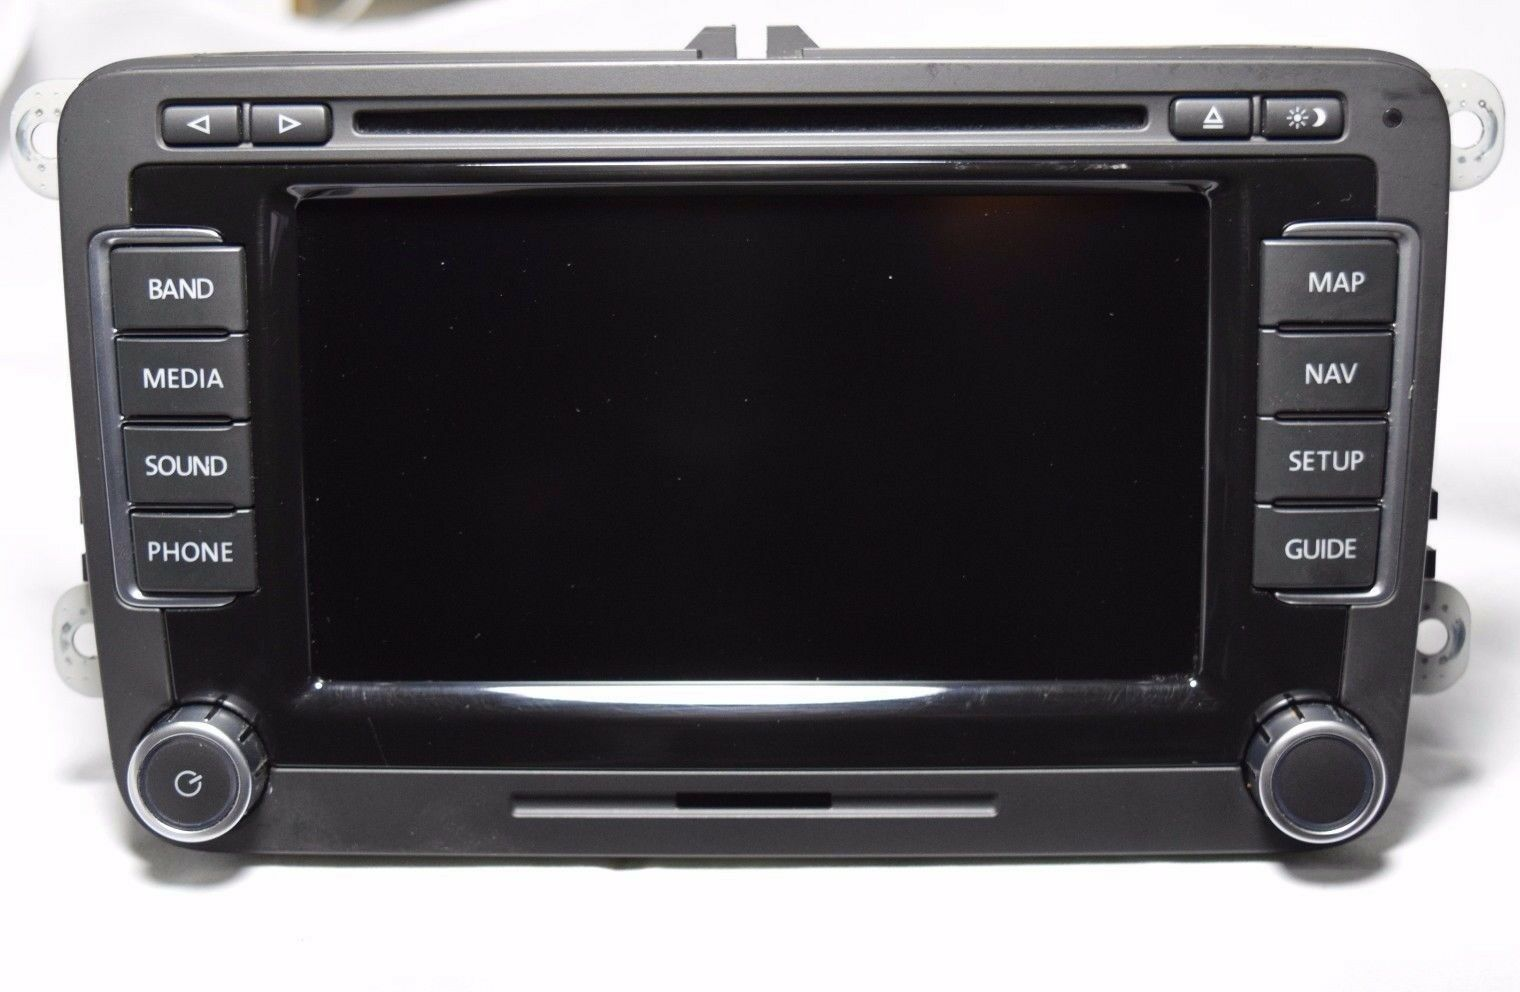 volkswagen vw passat rns 510 navigation system plus monitor radio 3c0035684a. Black Bedroom Furniture Sets. Home Design Ideas